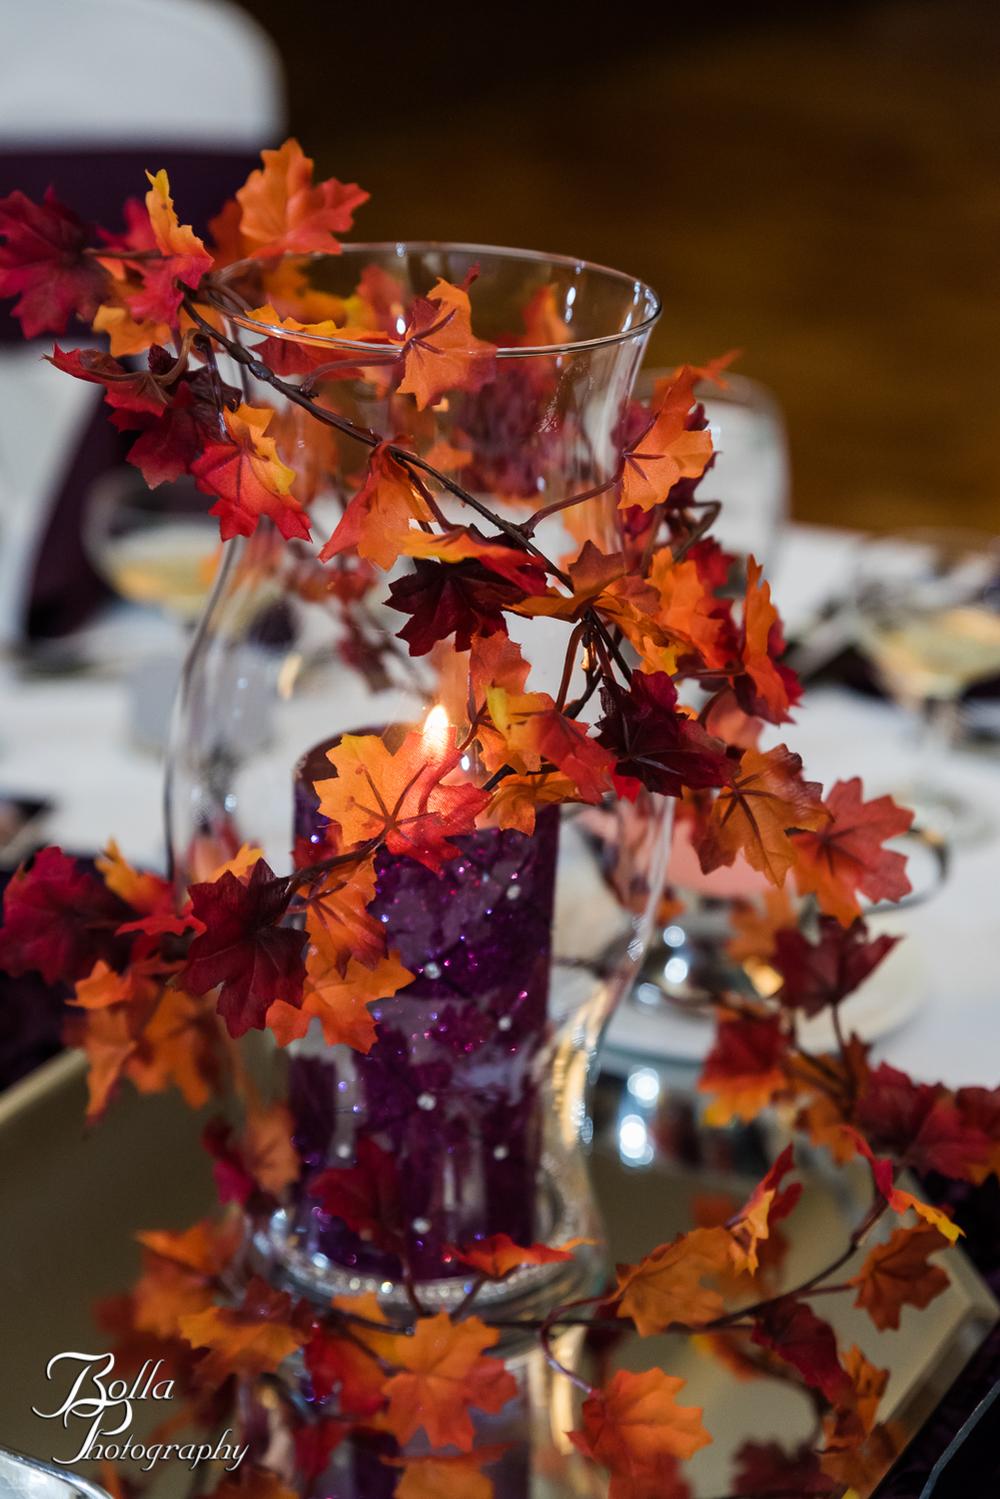 Bolla_Photography_St_Louis_wedding_photographer-0380.jpg